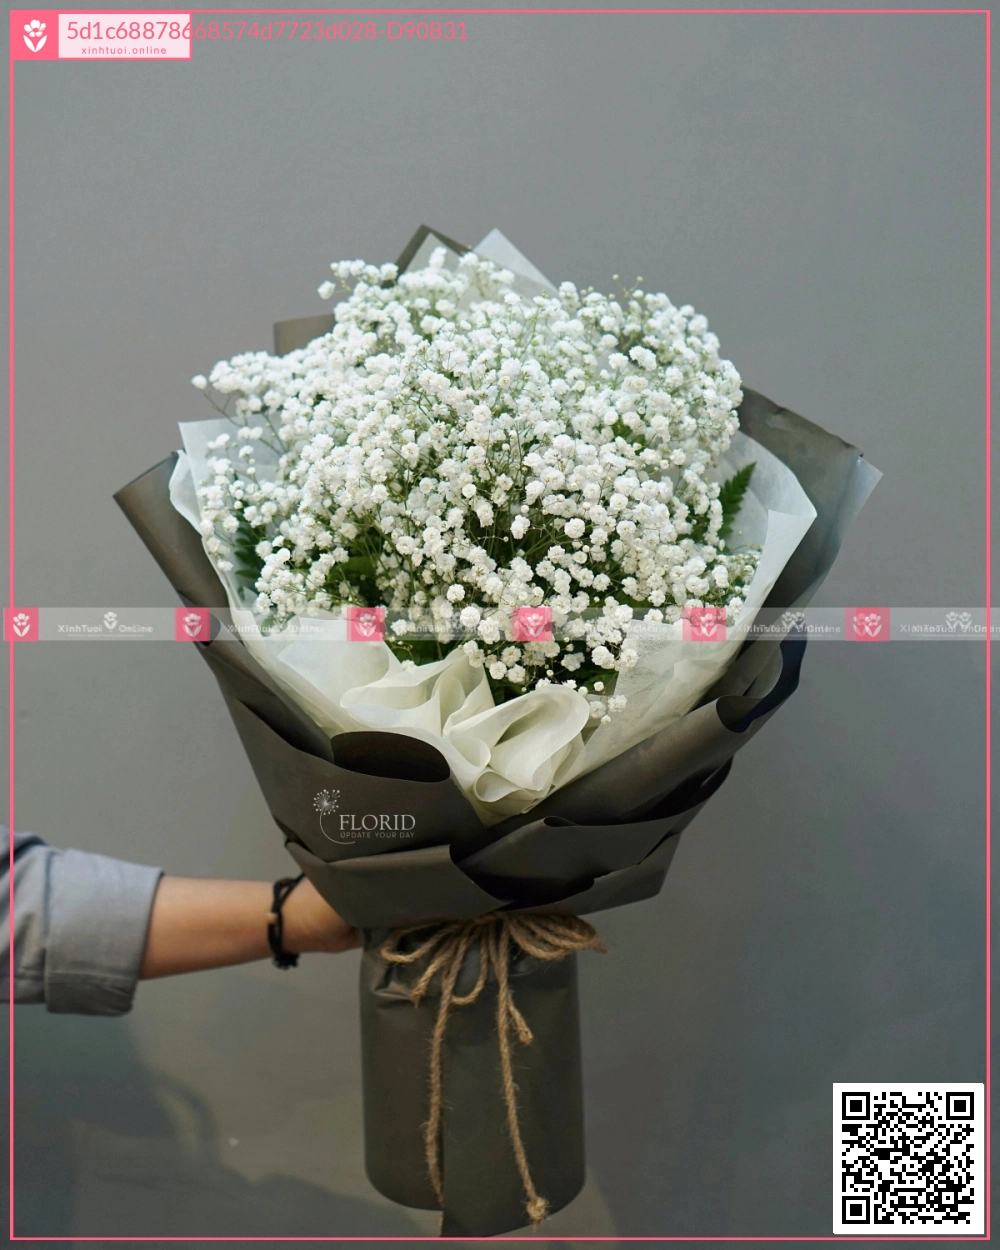 Romantic Love - D90831 - xinhtuoi.online